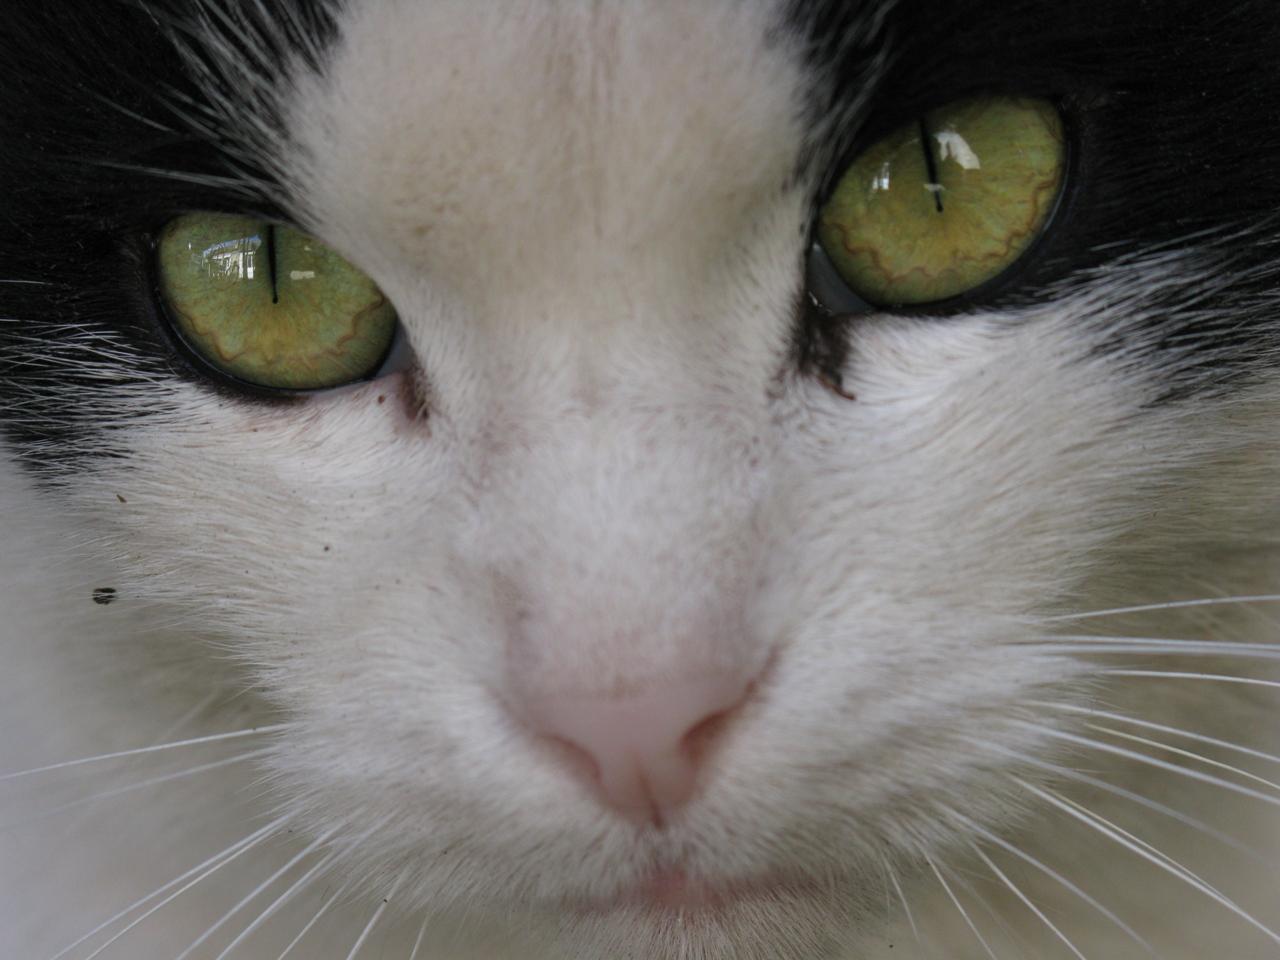 http://www.picgifs.com/wallpapers/wallpapers/cats/wallpaper_kat_animaatjes-28.jpg